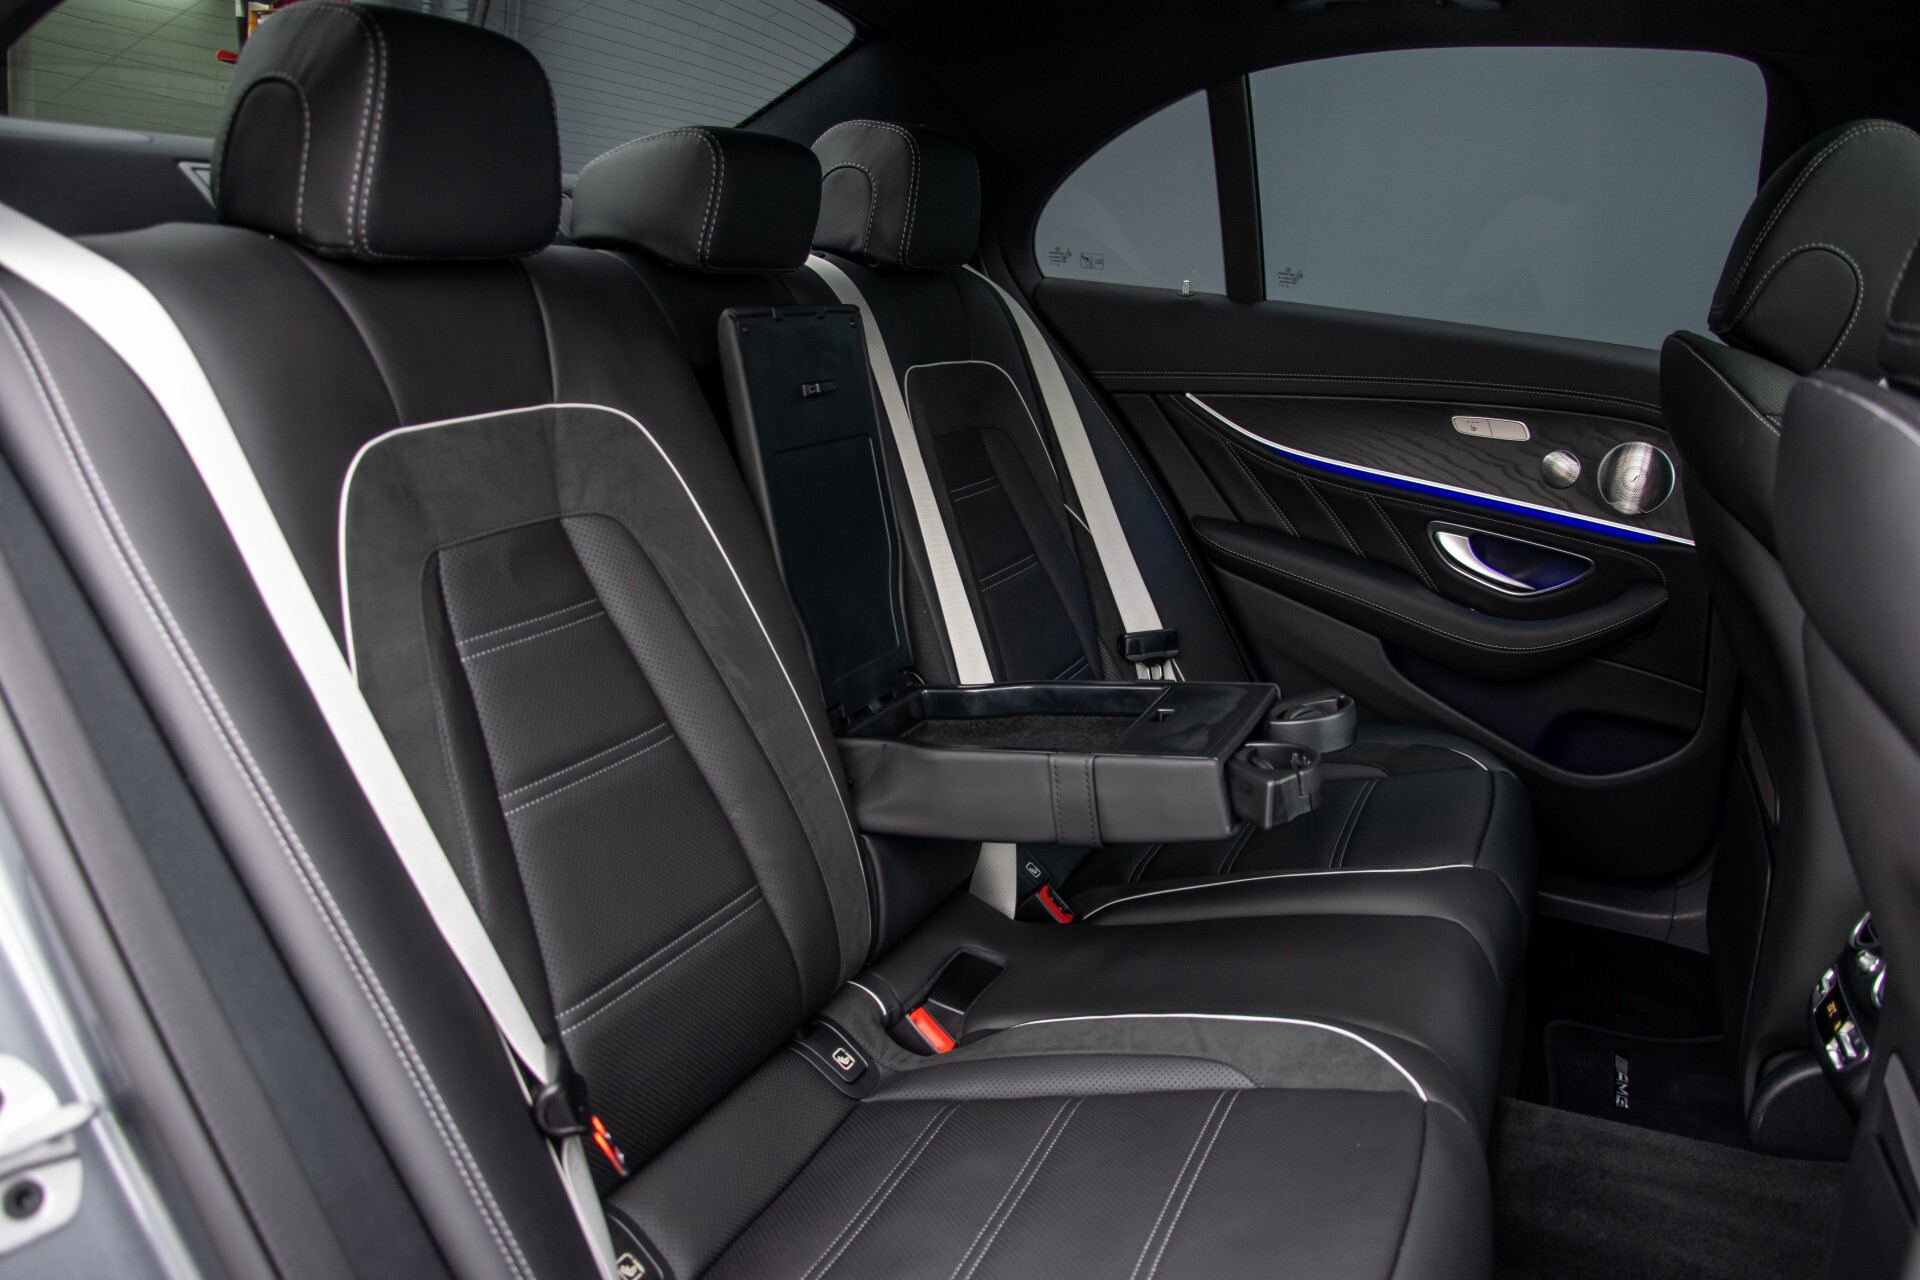 Mercedes-Benz E-Klasse 63 S AMG 4M+ NIEUW MODEL Night/Massage/Rij-assist/Keyless/Hud Aut9 Foto 4